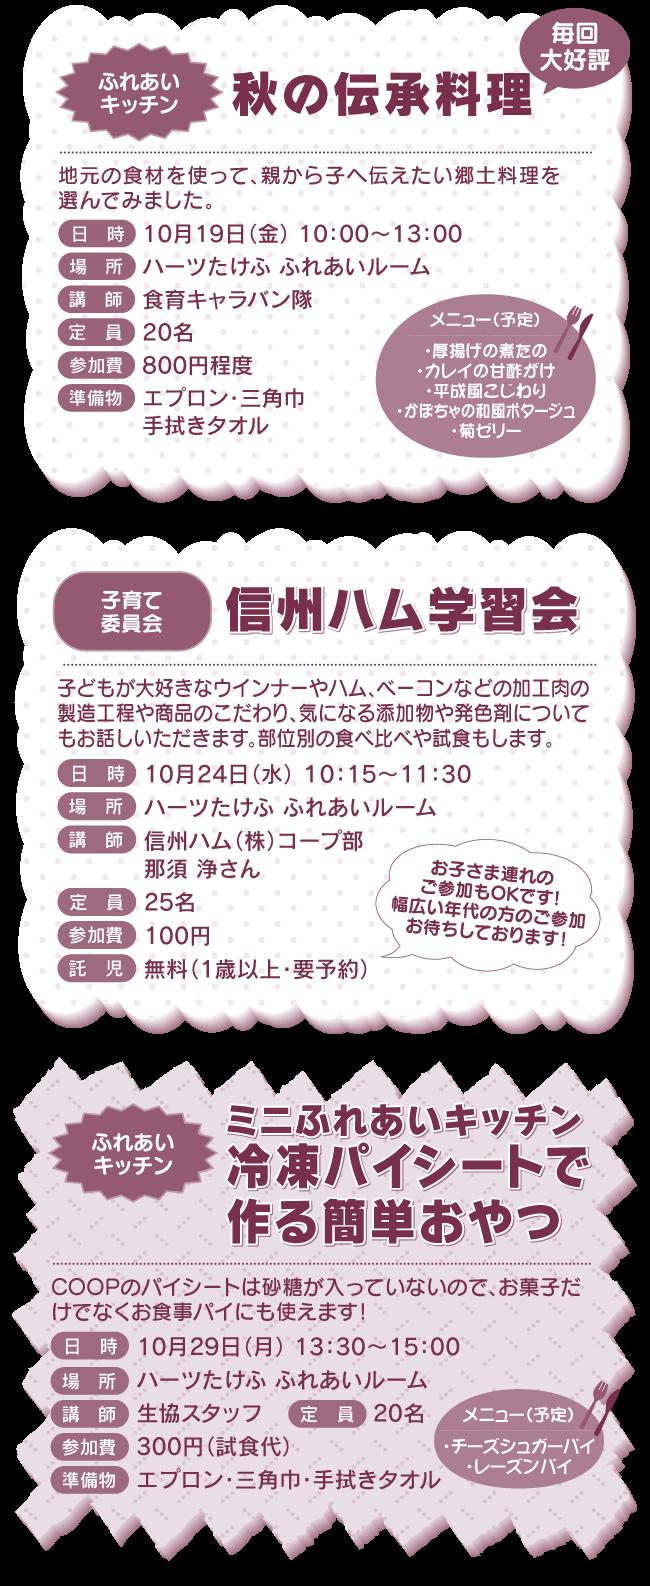 event2_20180910_11